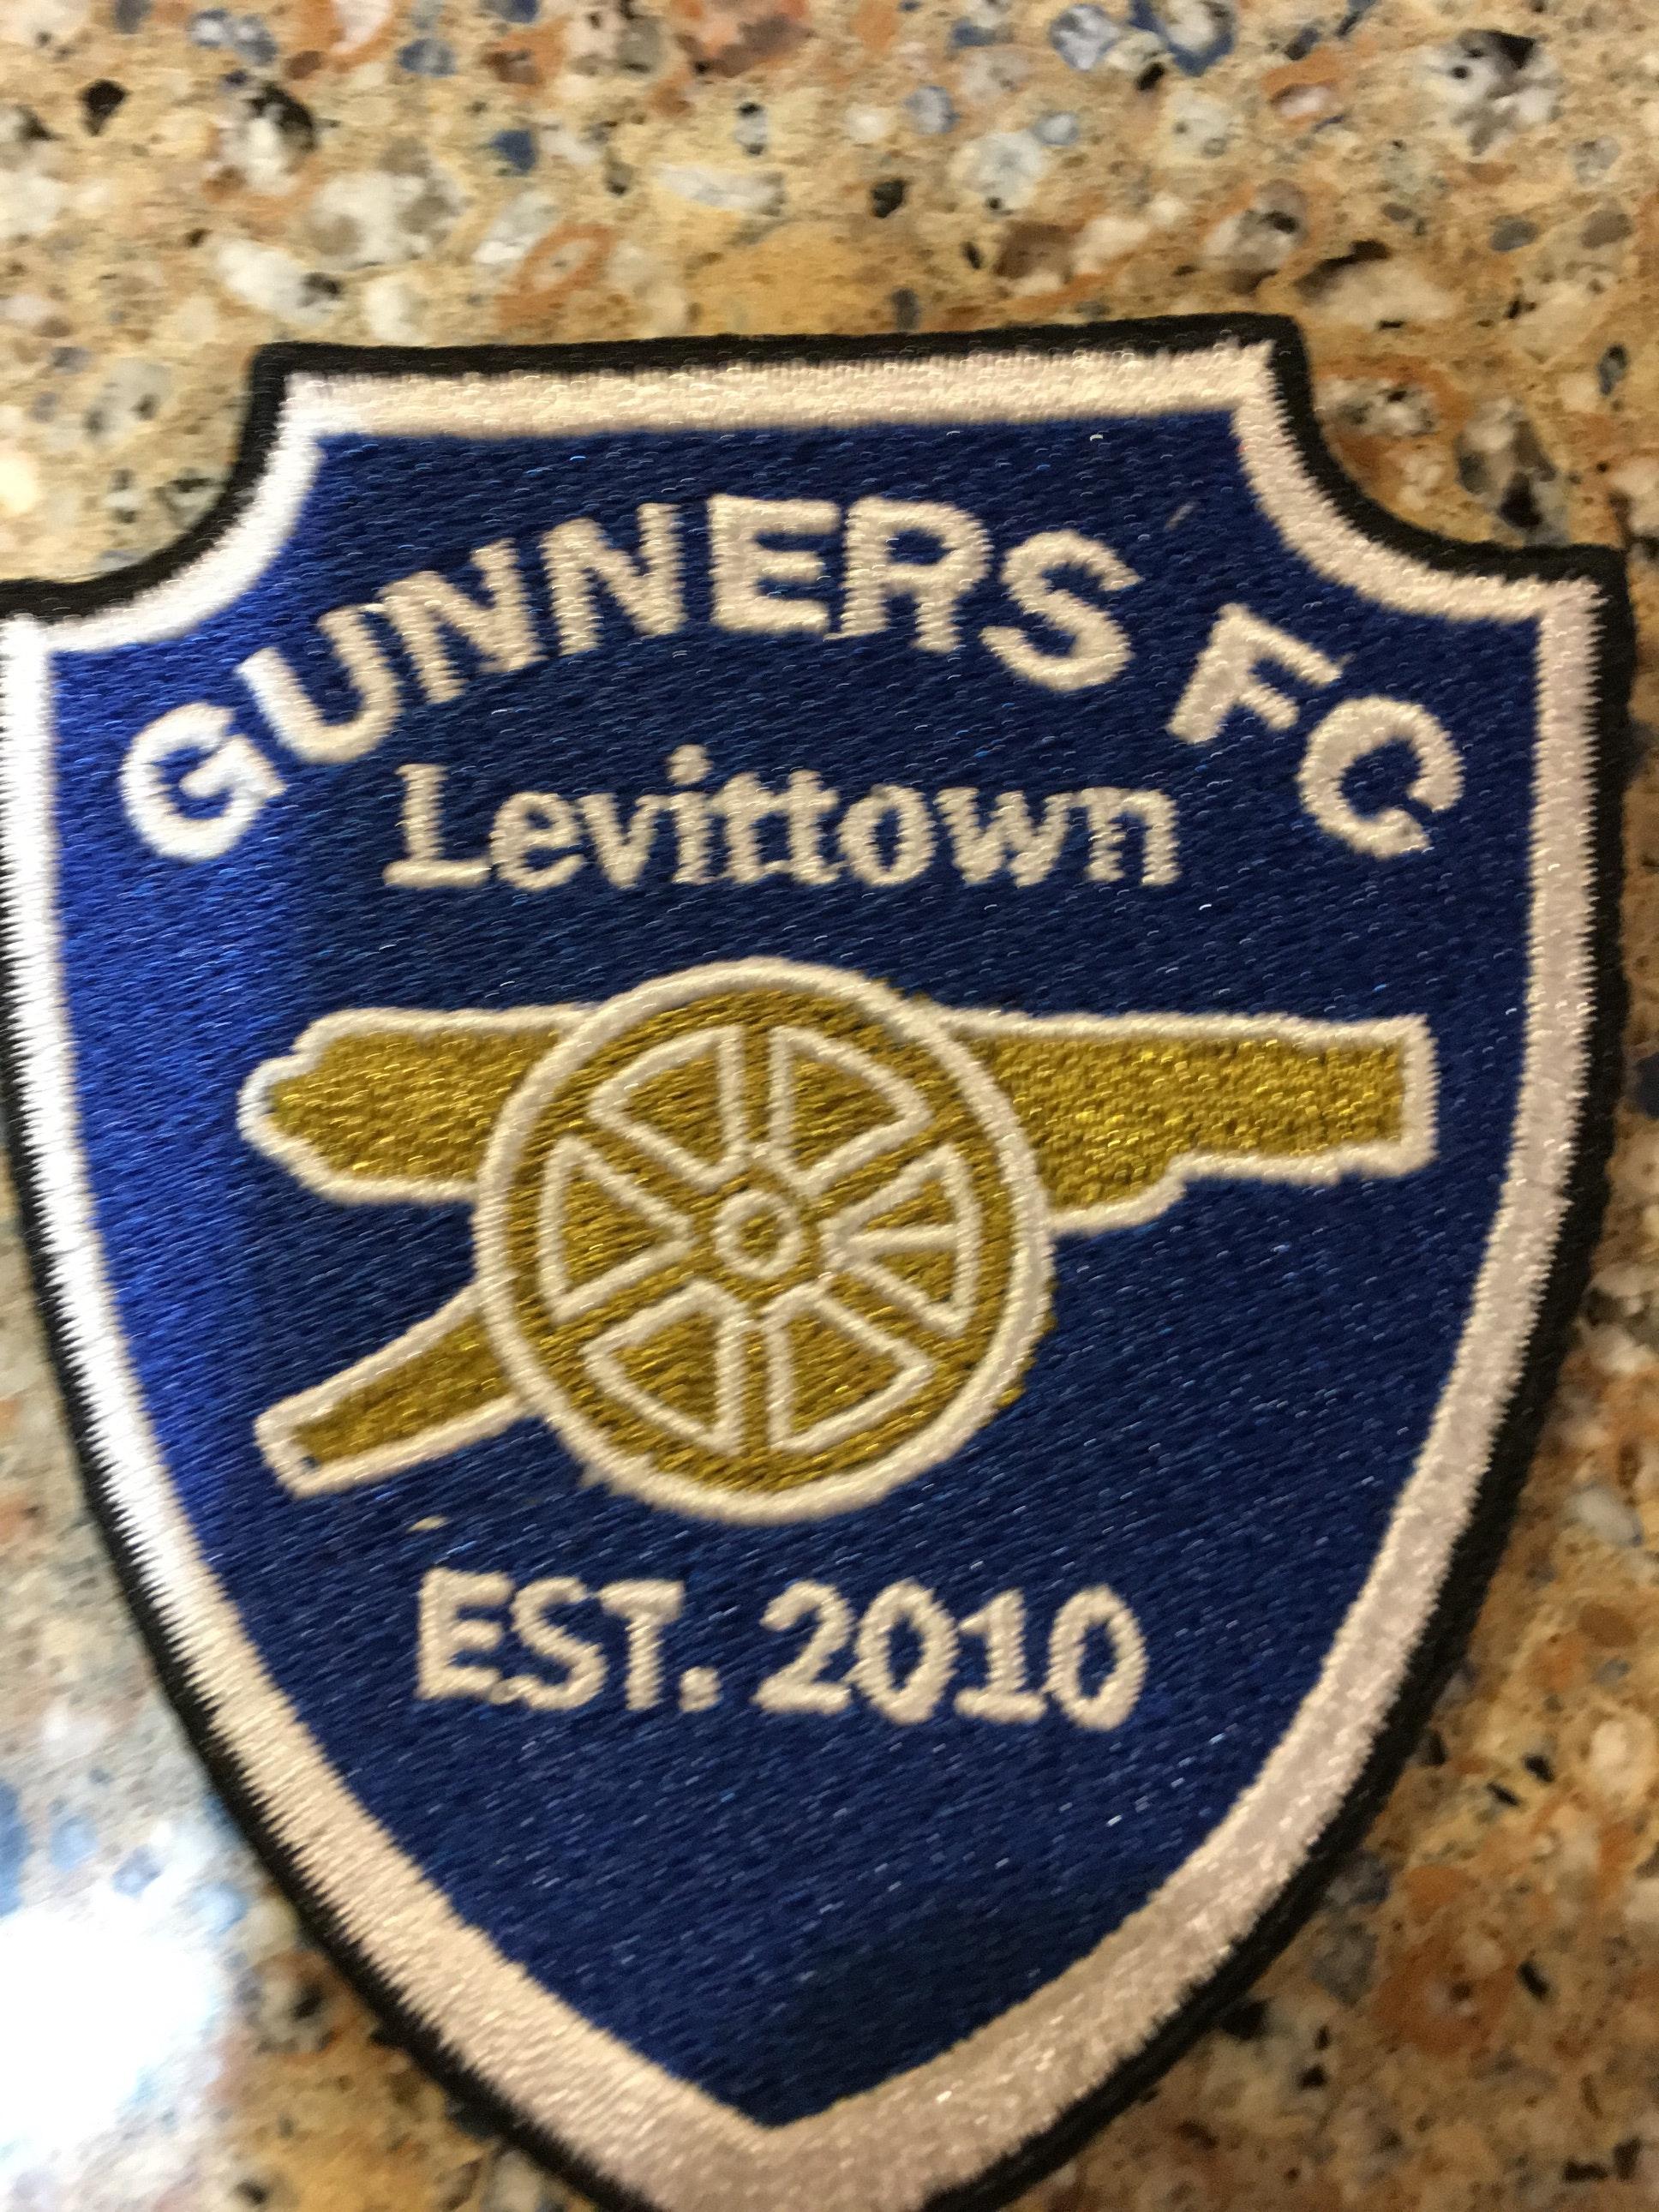 FC USA Levittown Gunners